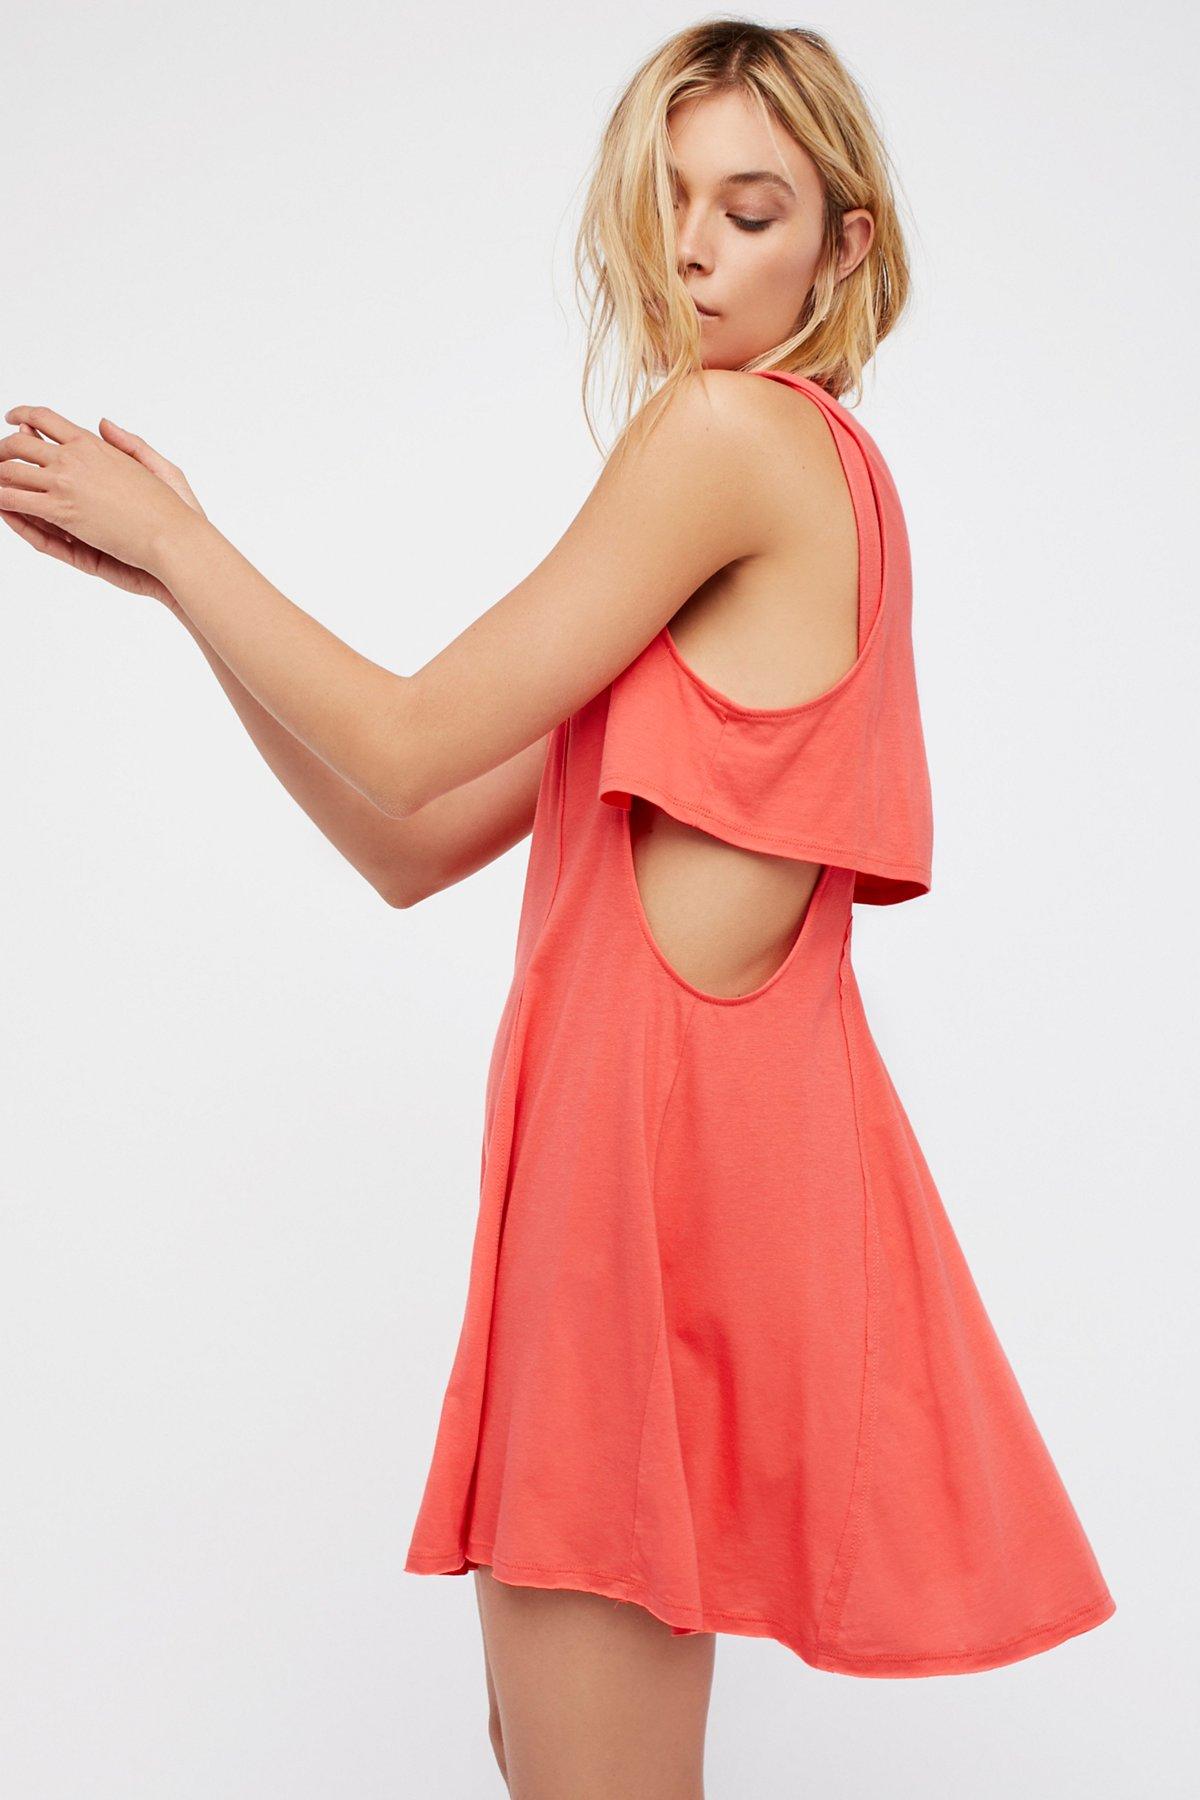 Tiny Twirl迷你连衣裙